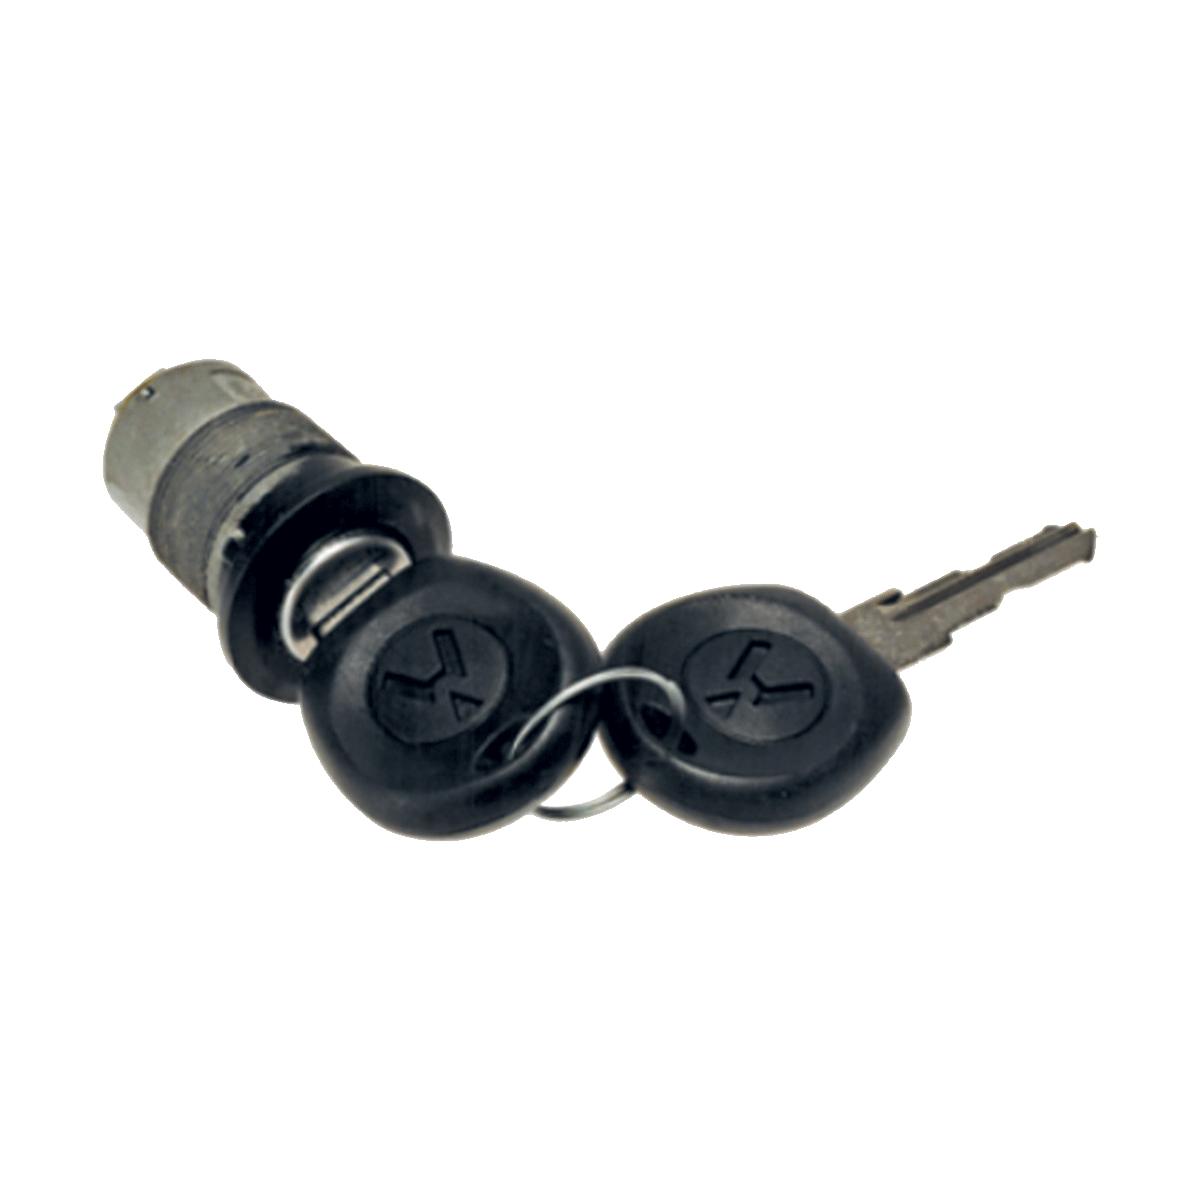 Cilindro Porta Malas|Passat 3 Portas 1974 até 1988 Com Chave